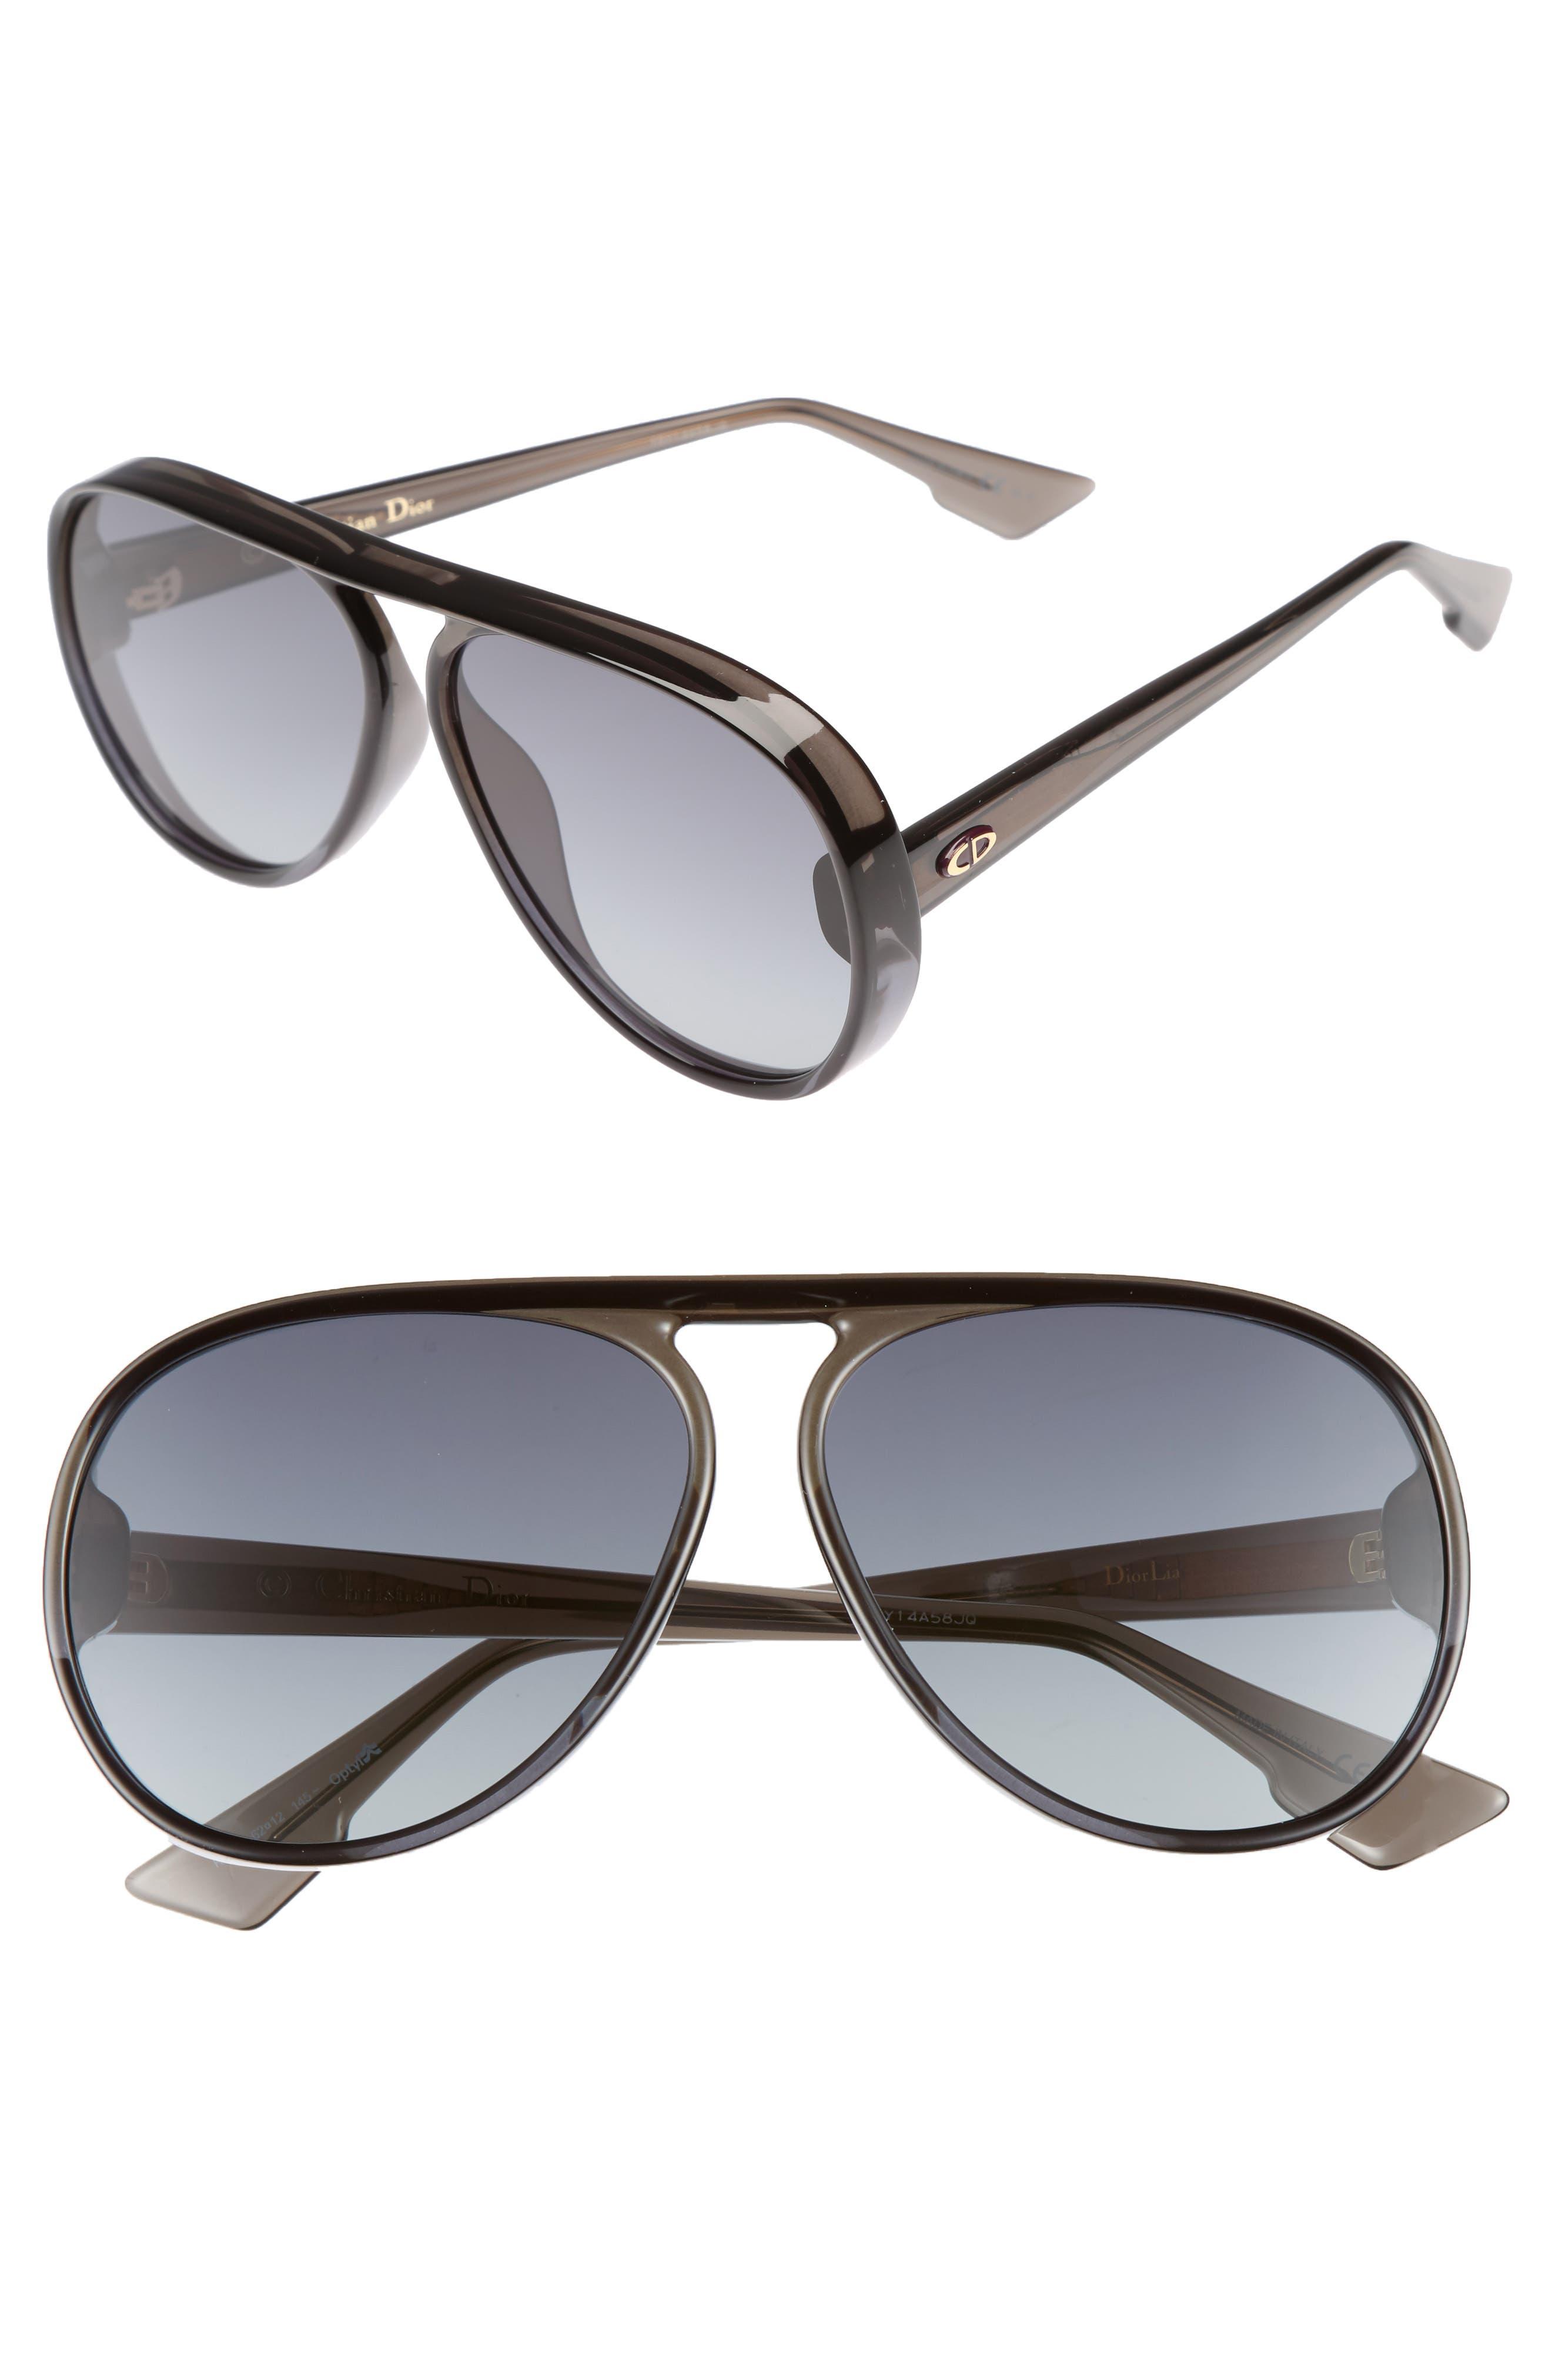 Lia 62mm Oversize Aviator Sunglasses,                         Main,                         color, 020